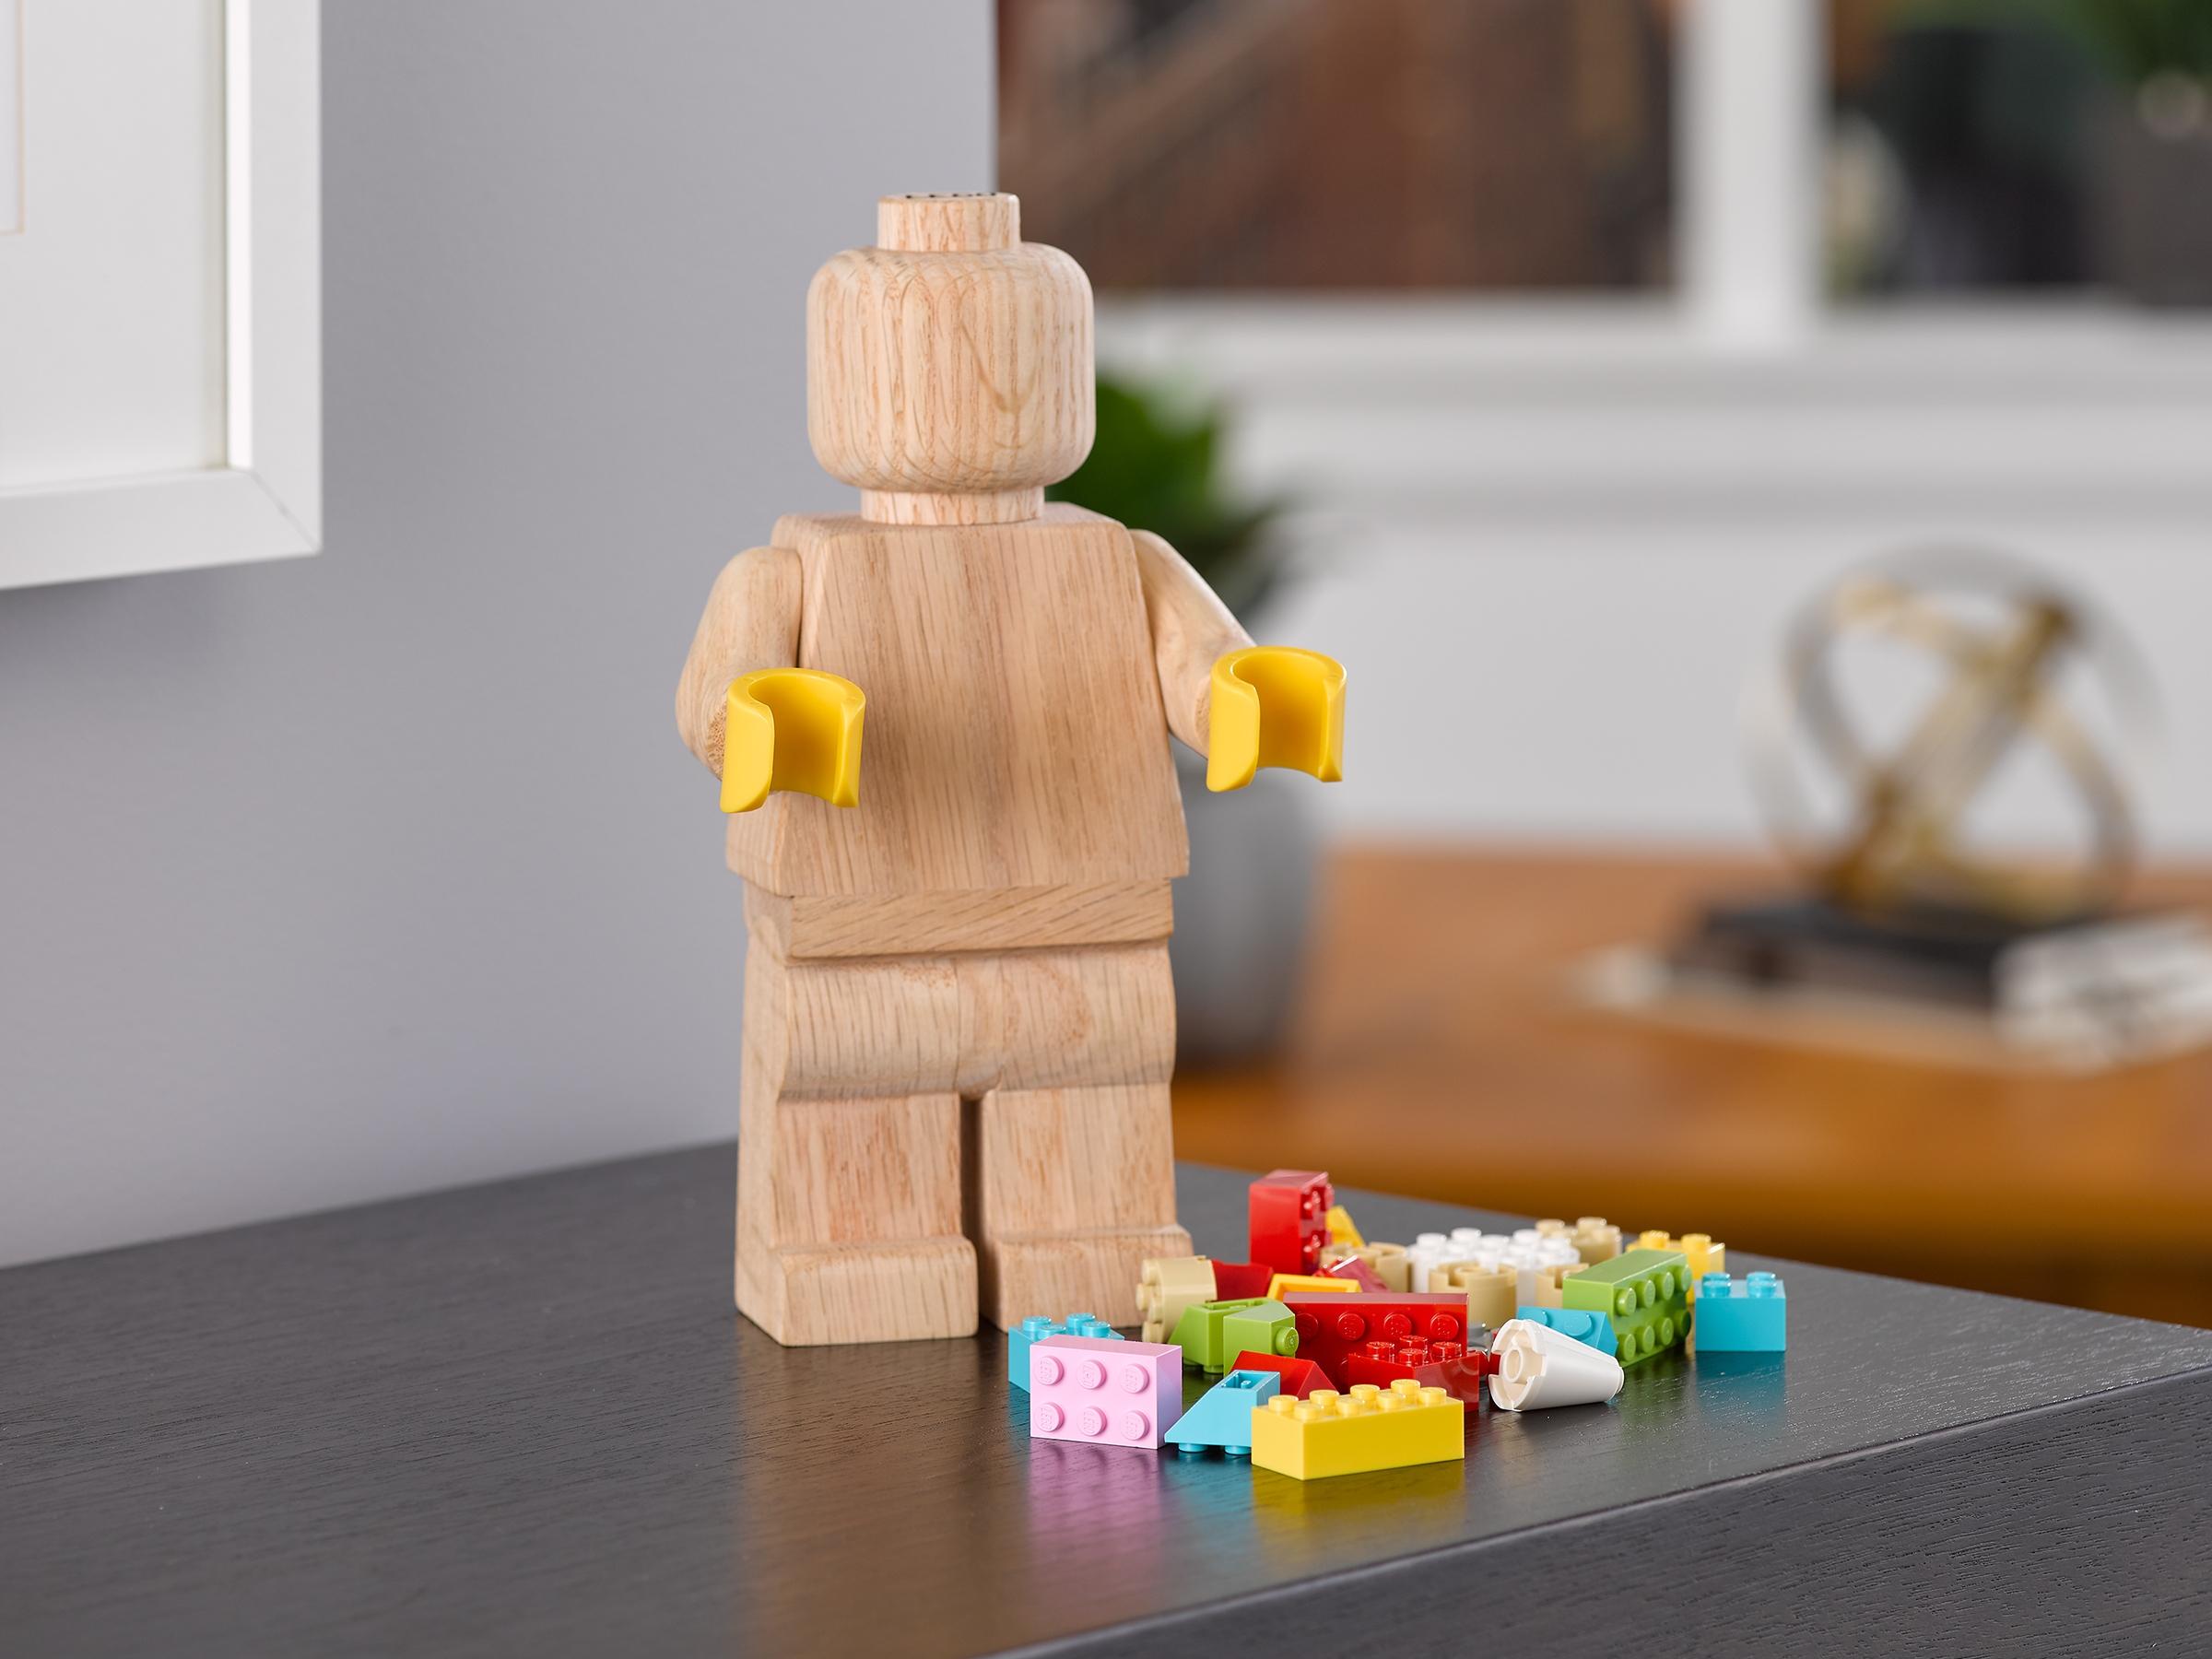 lego 853967 puinen minihahmo